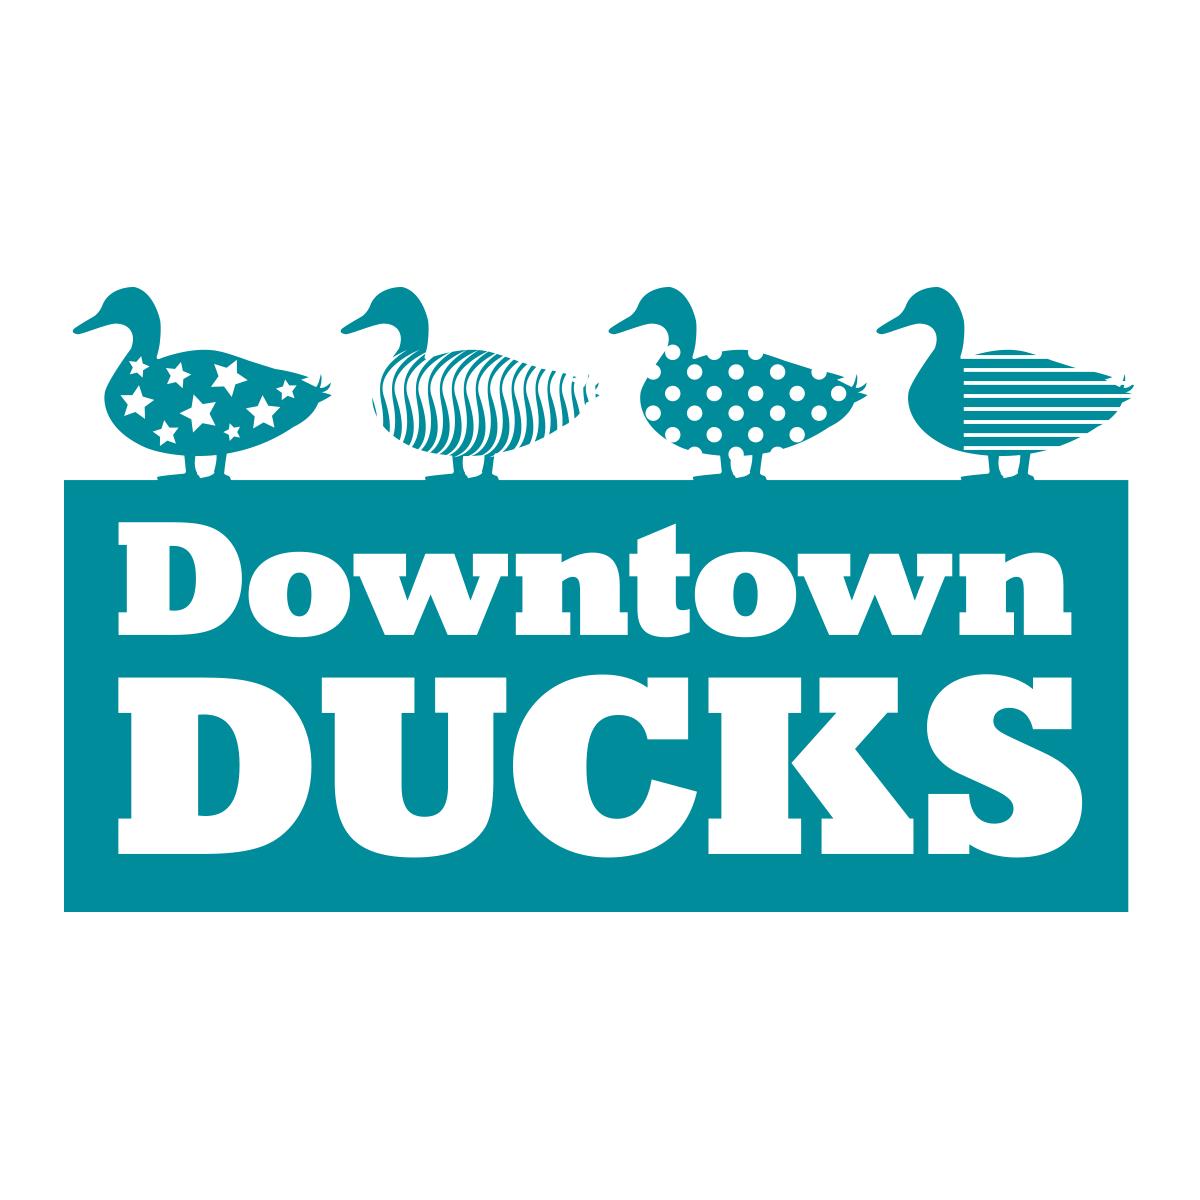 Downtown Ducks, Public Art Project